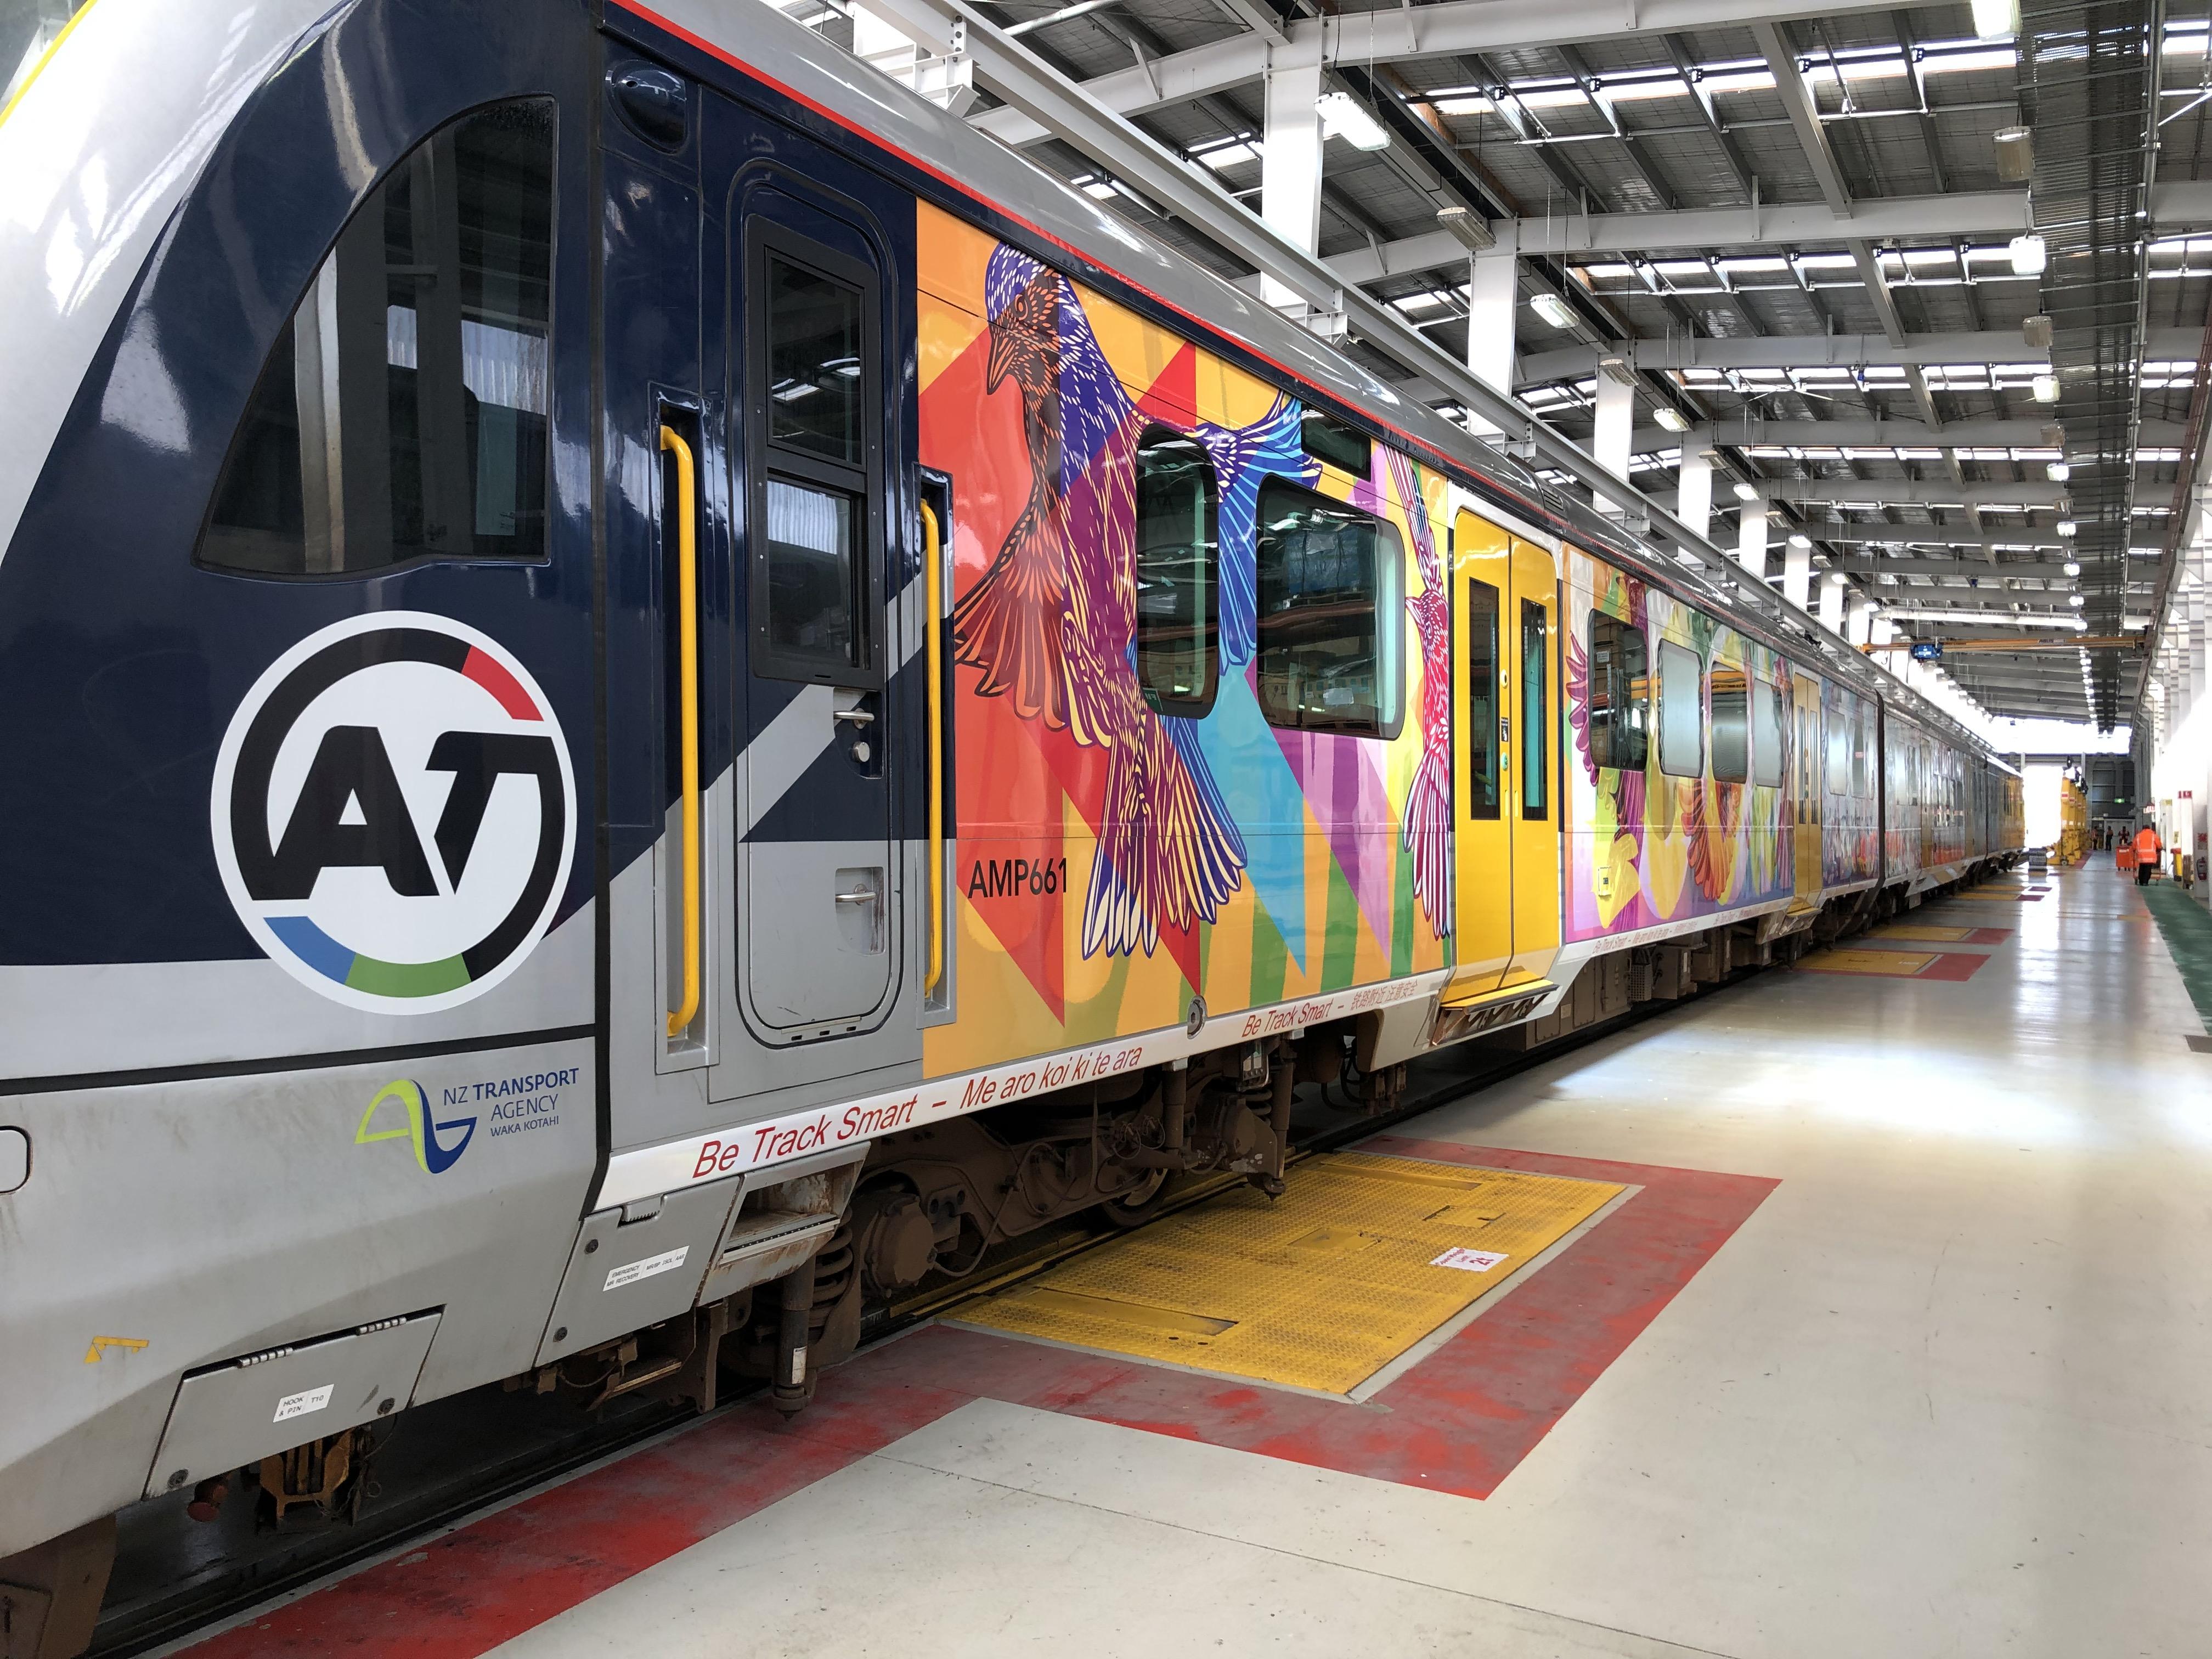 'Look both ways' Train Art